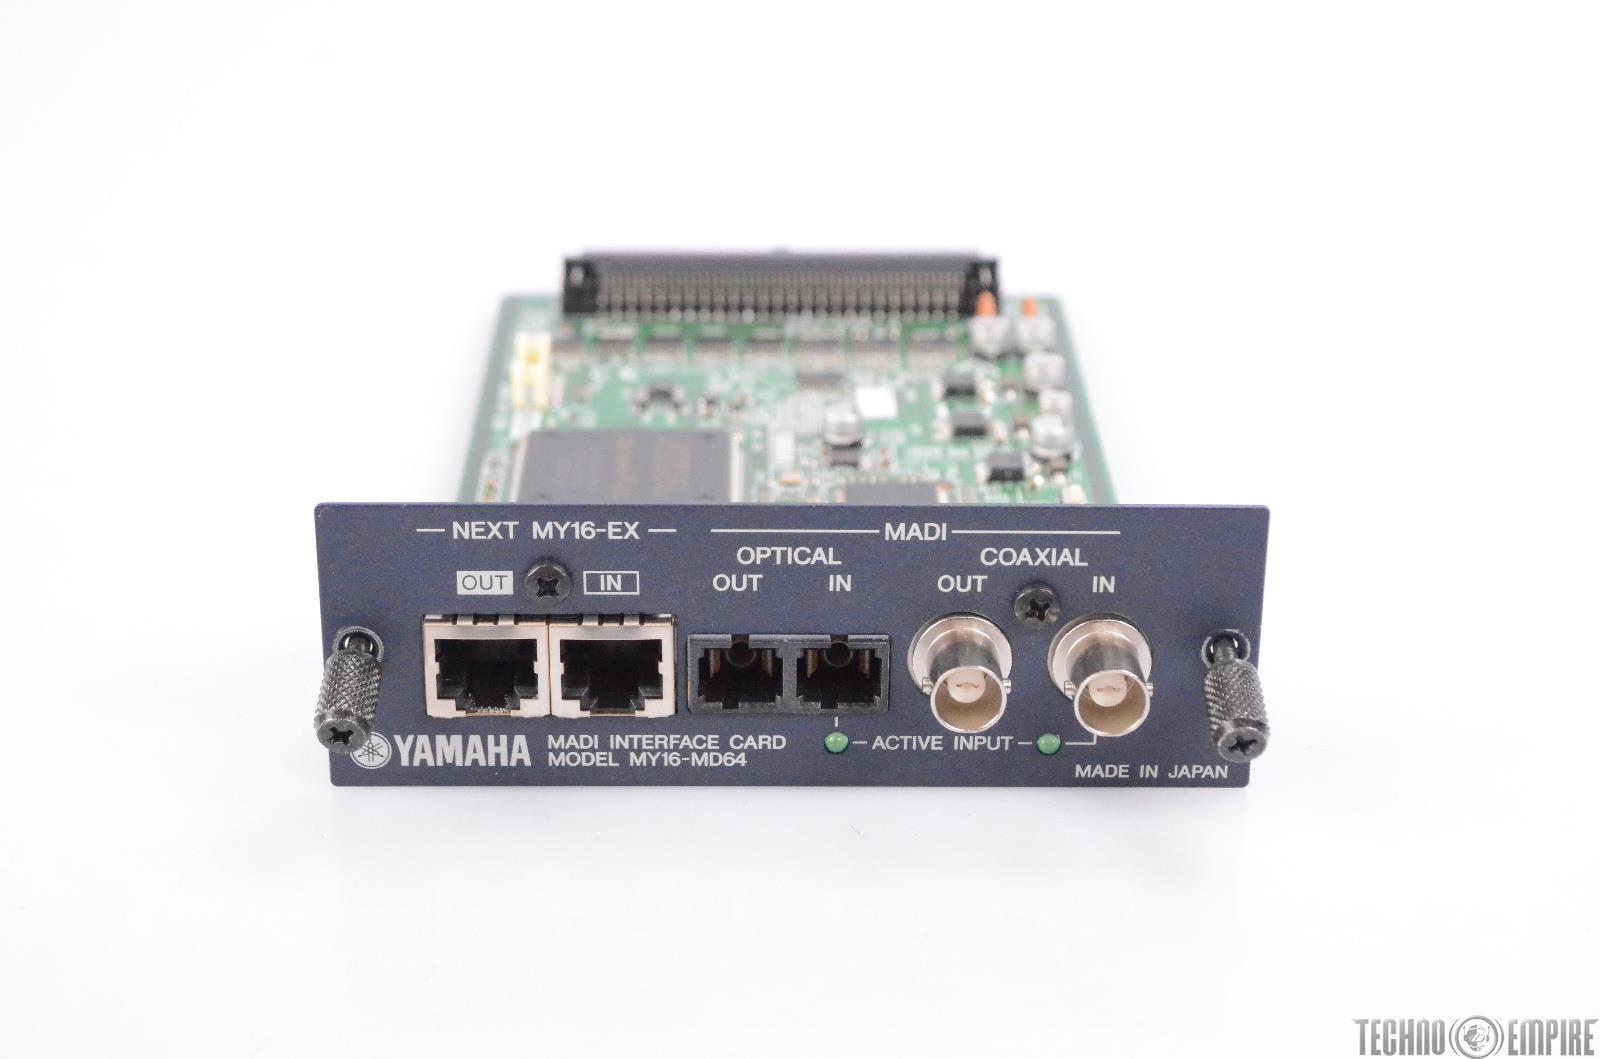 Yamaha MY16-MD64 16 Channel MADI I/O Interface Expansion Card Mini-YGDAI #31170